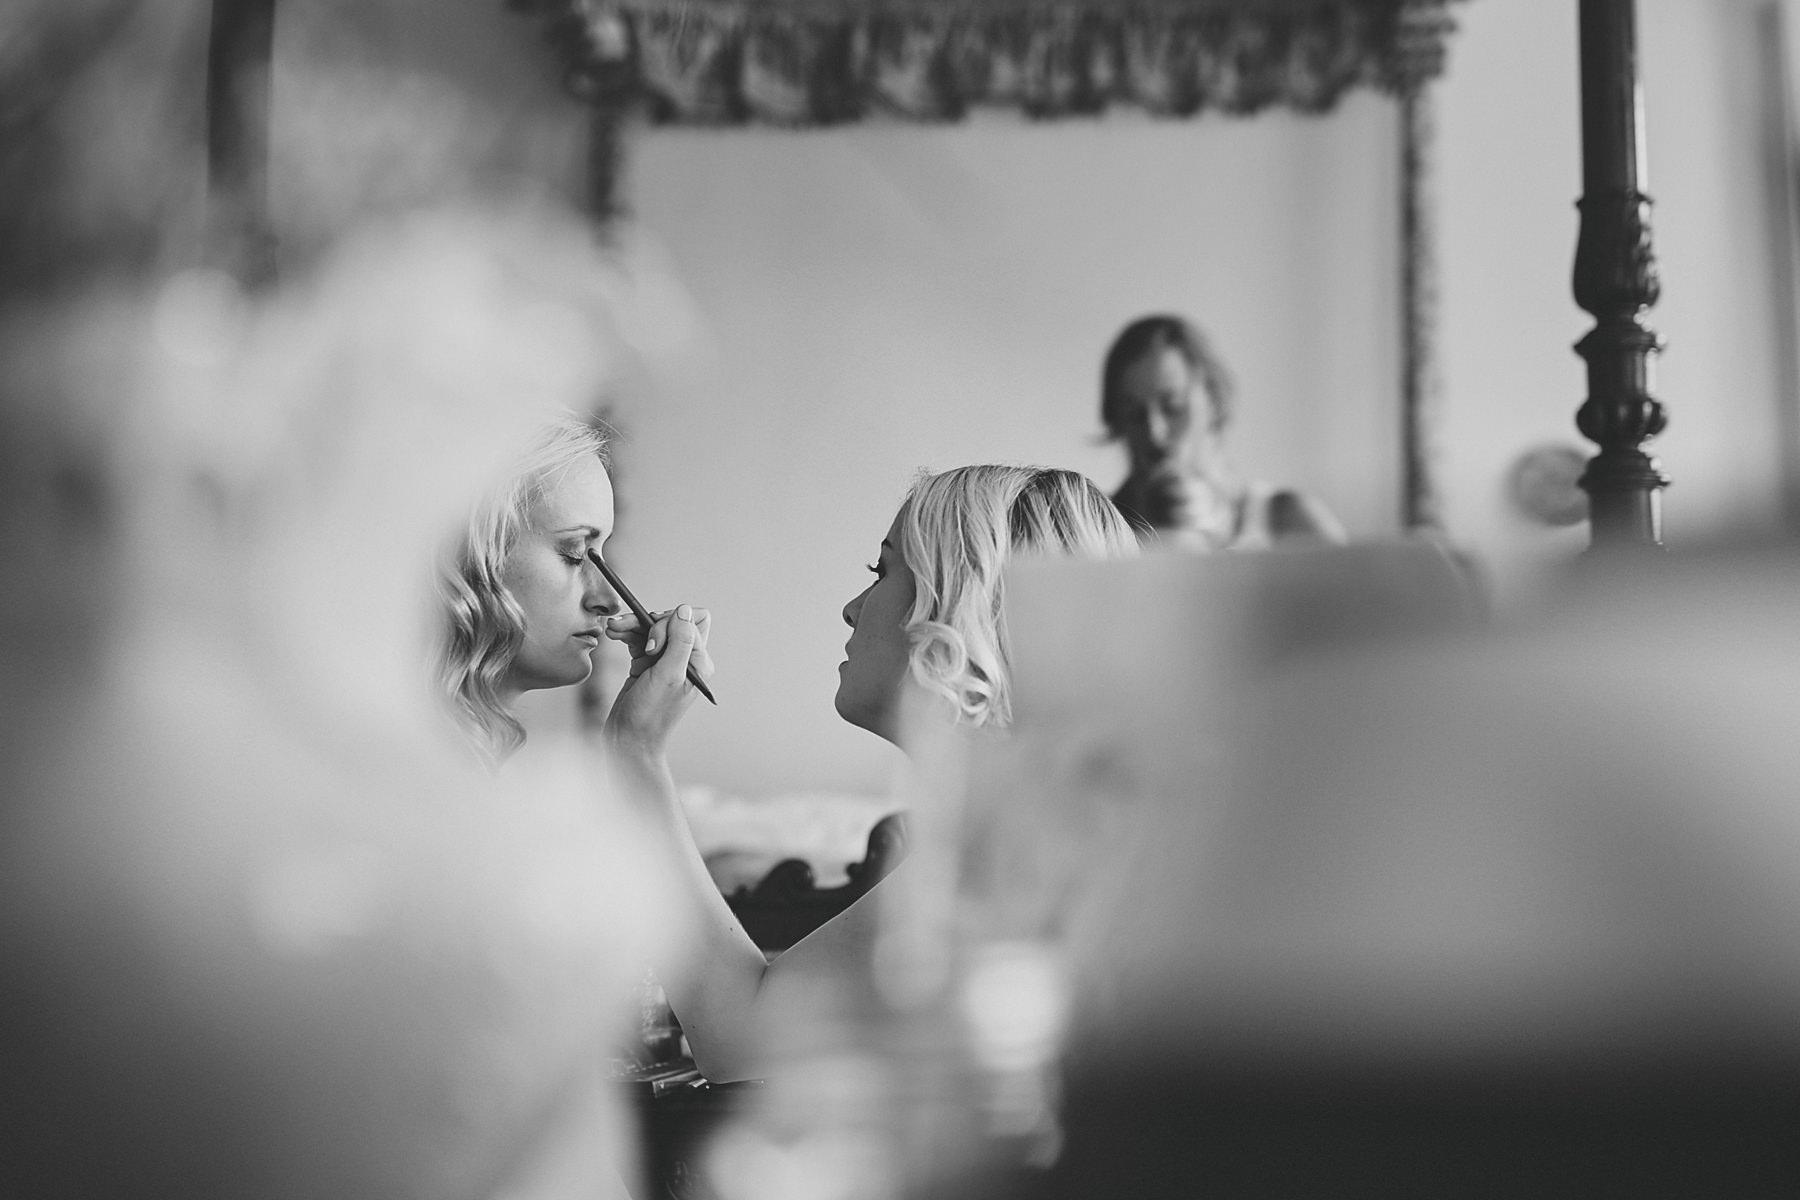 Wedding at Borris House co.Carlow 011 - Borris House wedding | Cara & David